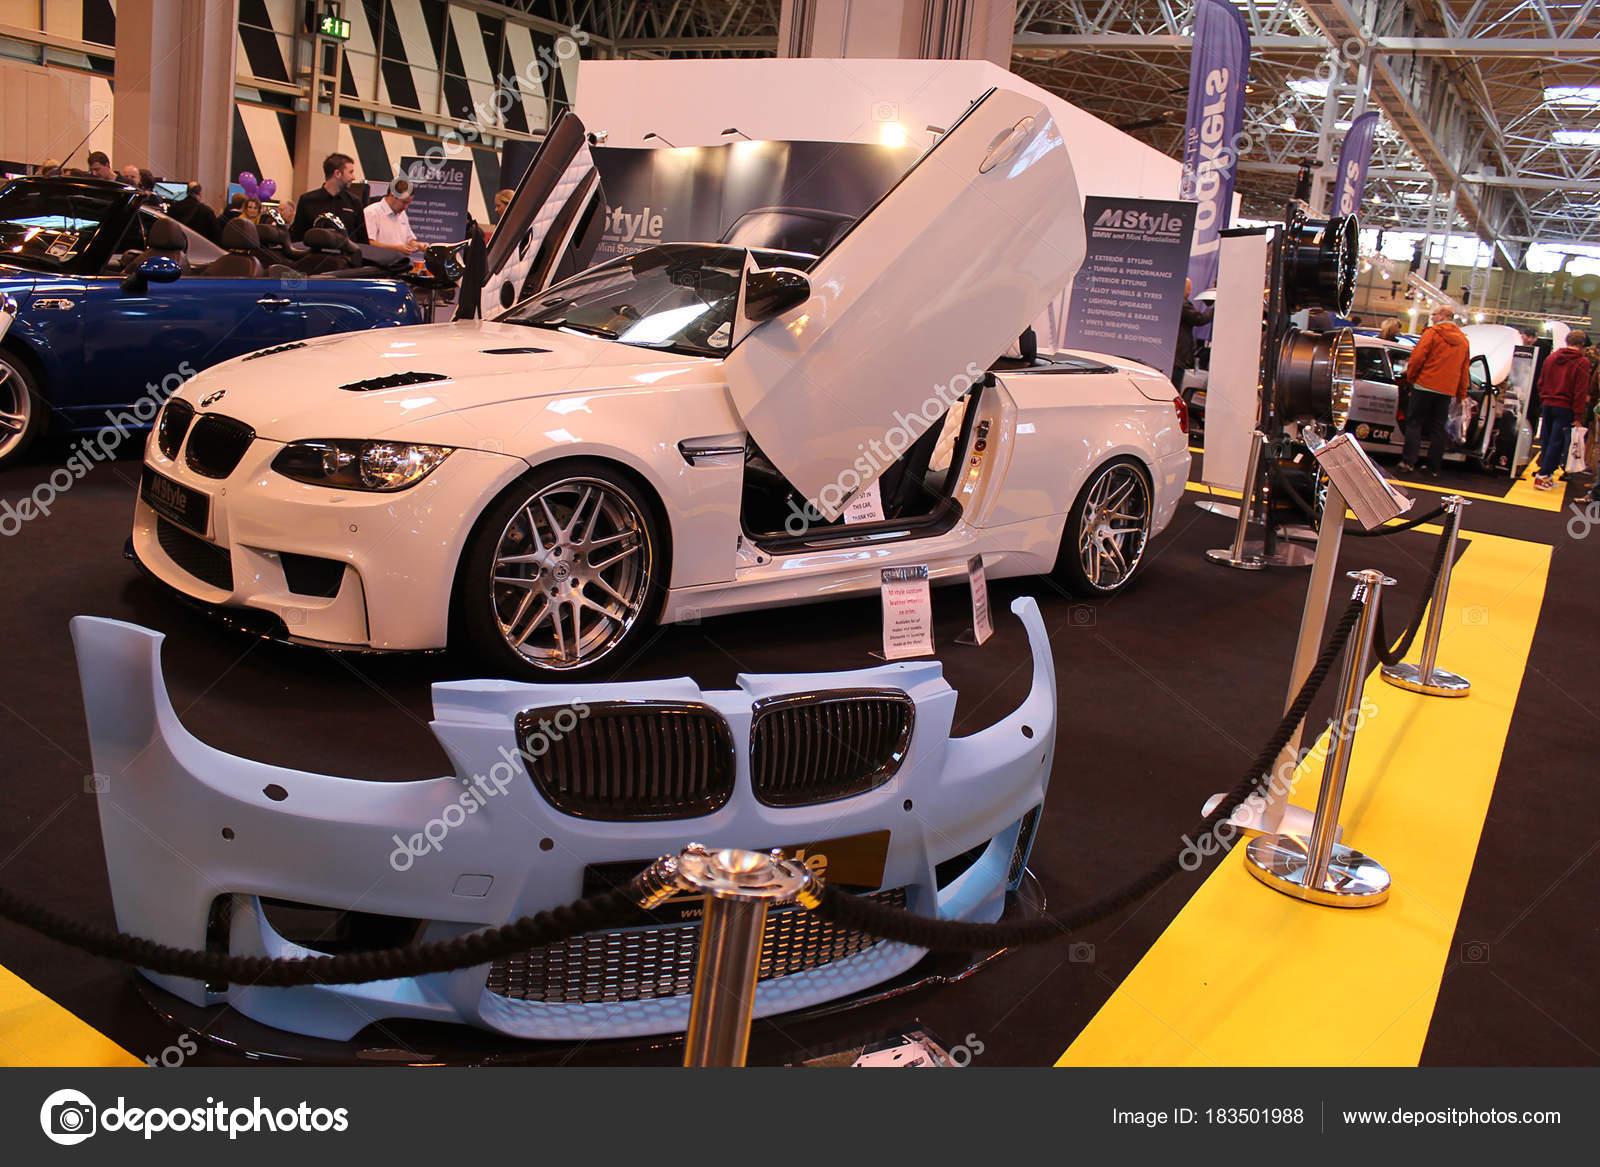 Birmingham October 2012 Bmw Tuning Cars Display Top Gear Car Stock